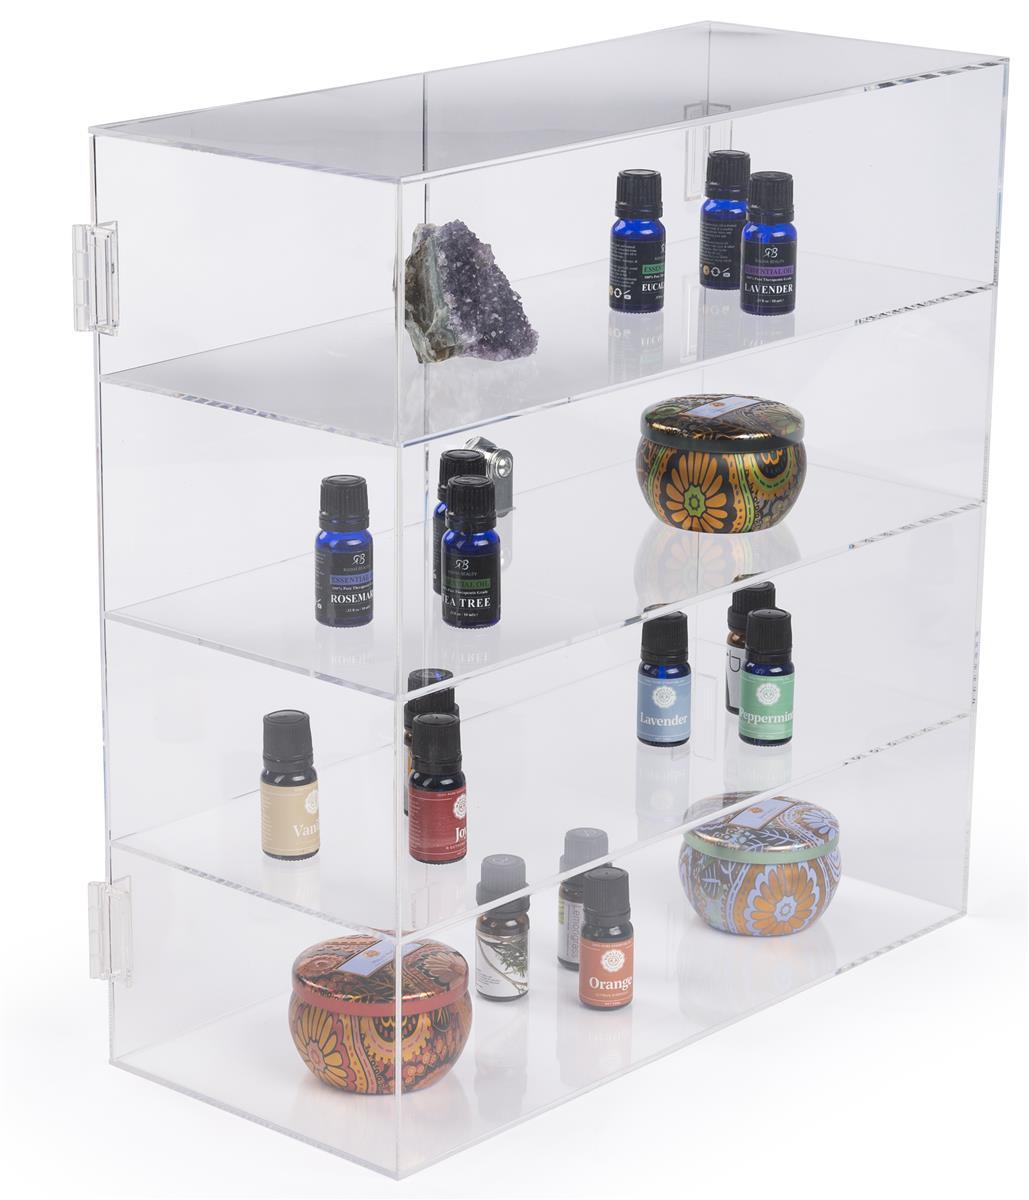 Acrylic Display Case Locking Hinged Doors Amp 3 Shelves